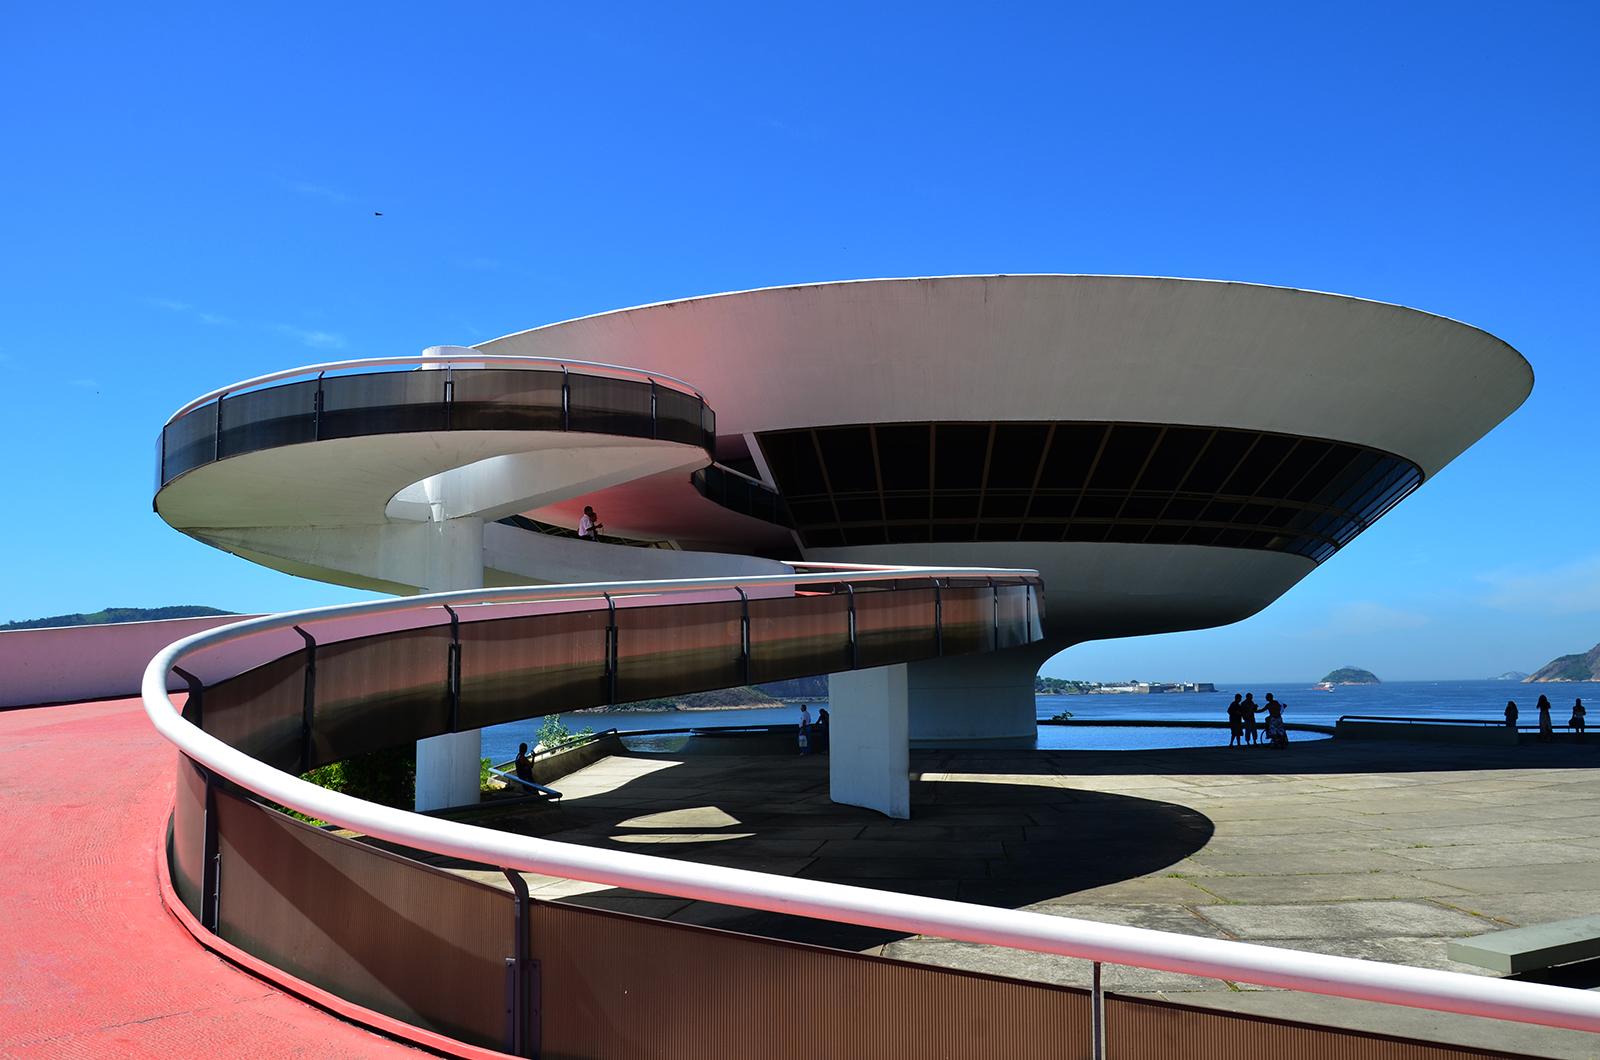 The Niterói Contemporary Art Museum. Photography: Rodrigo Soldon